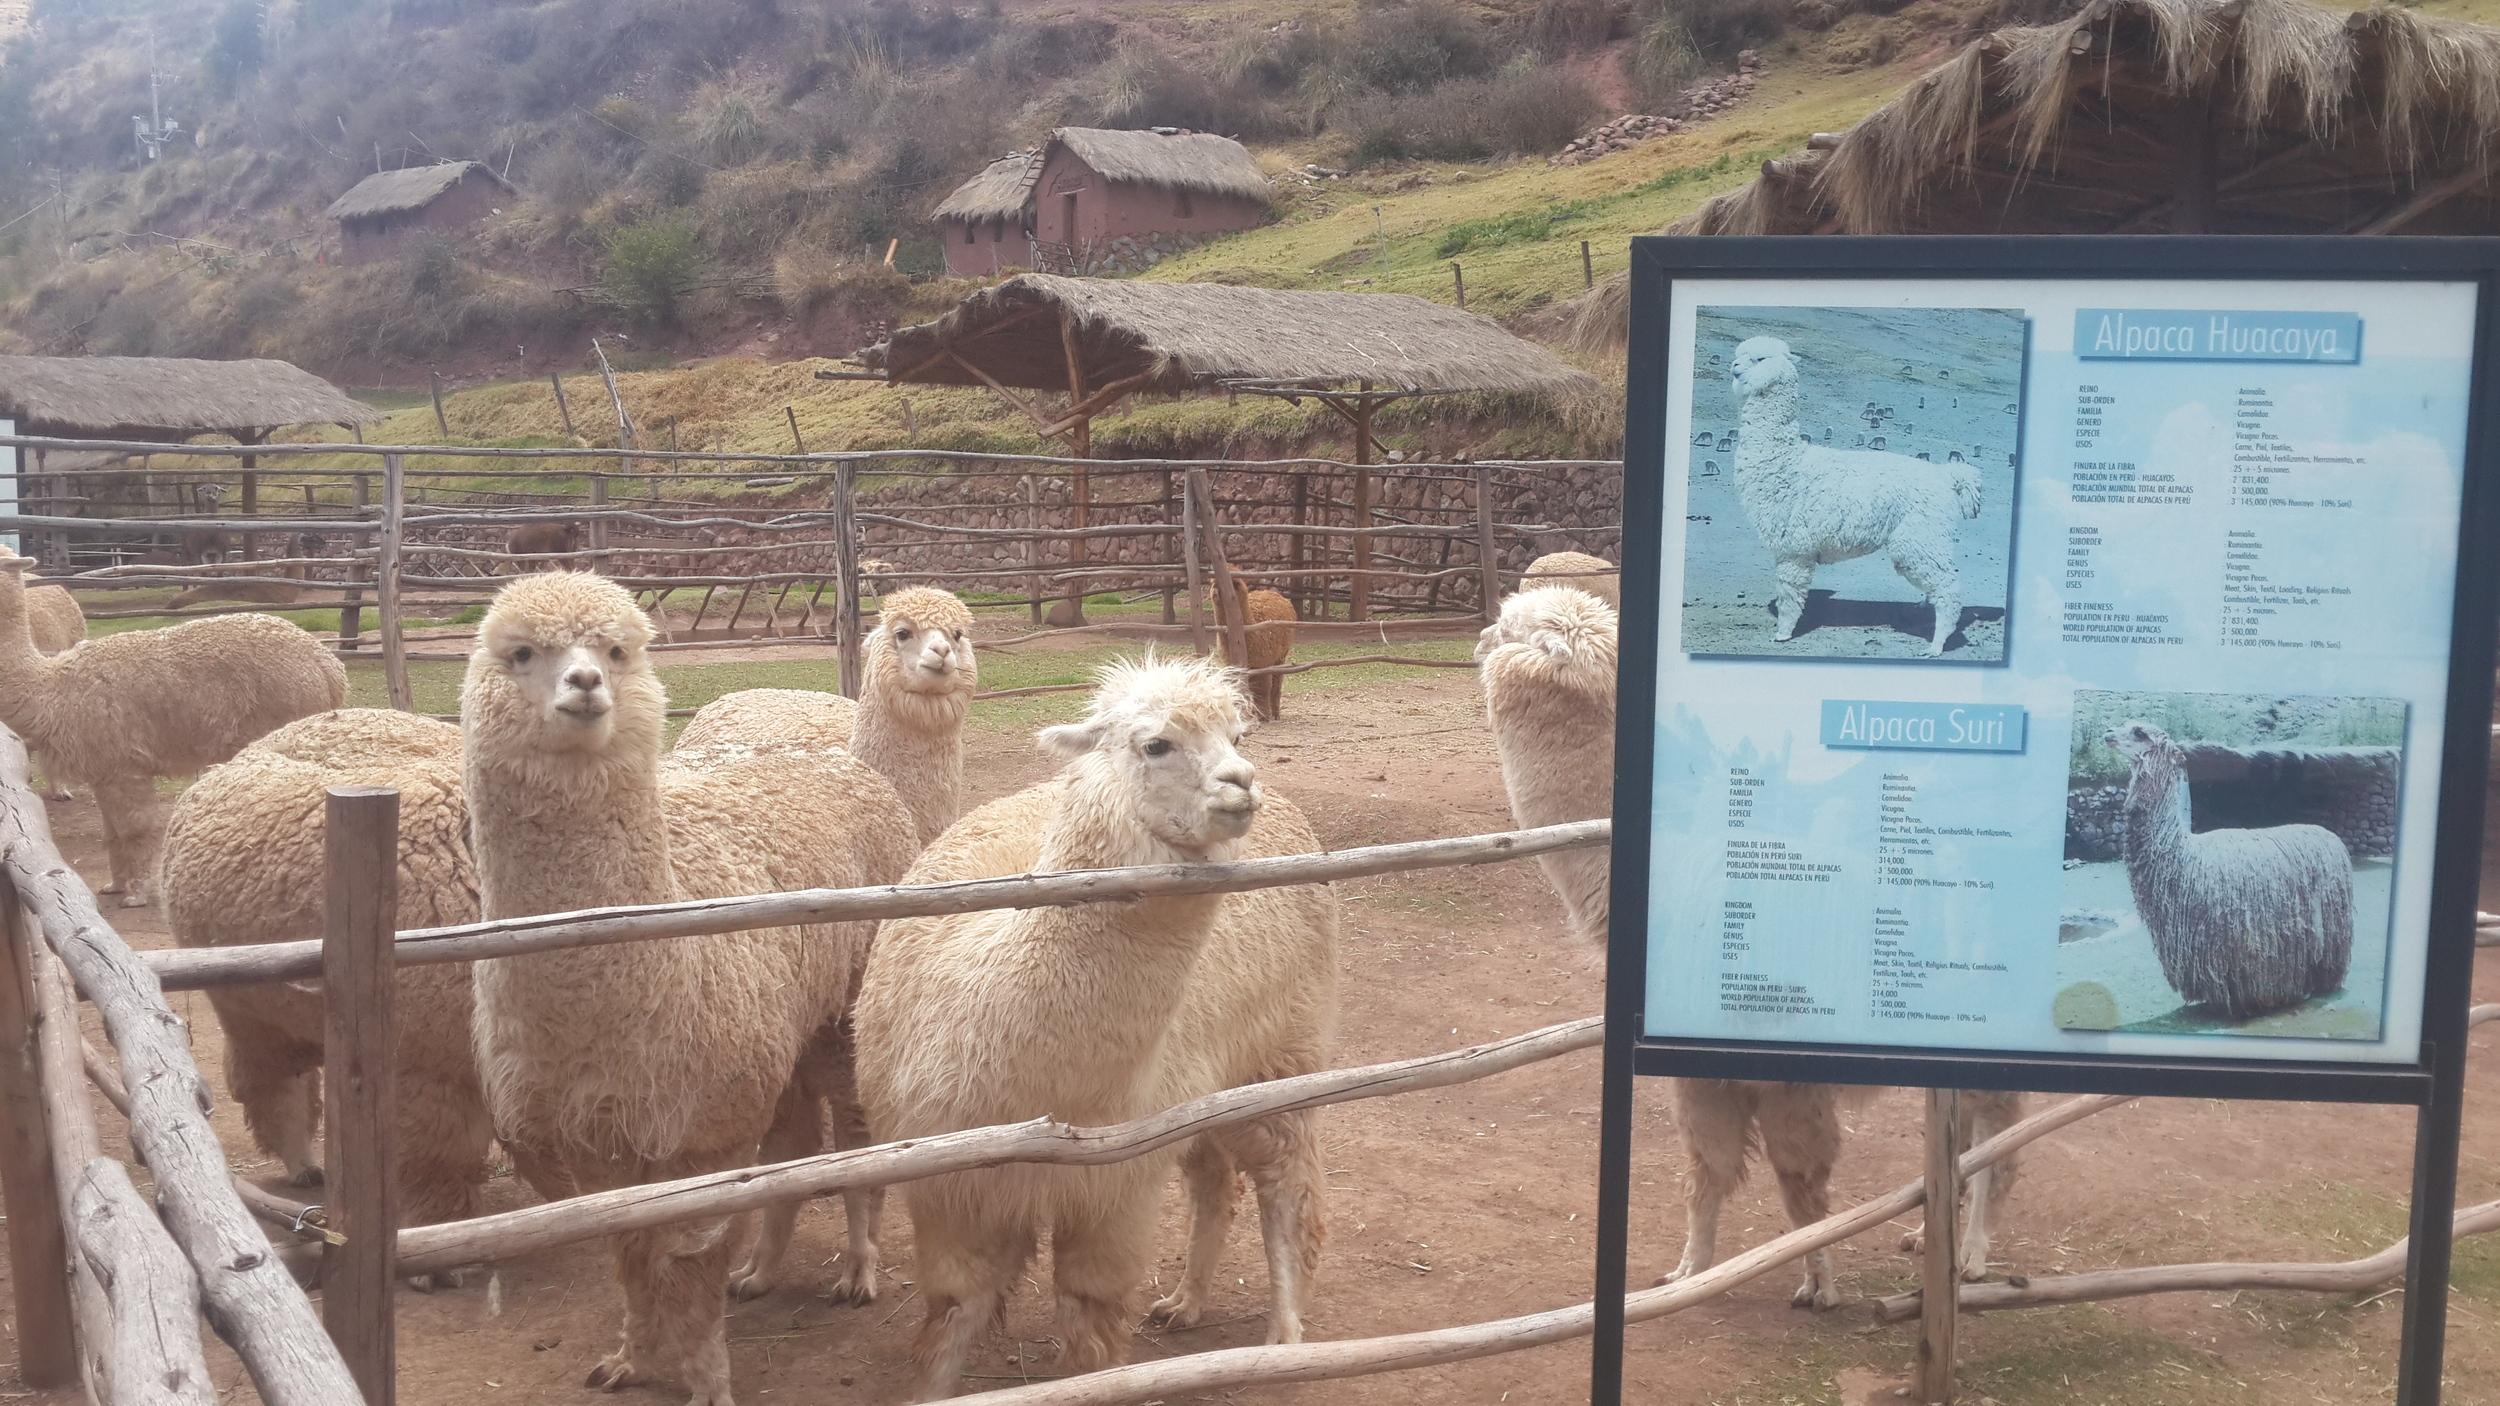 Llama and alpaca feeding corrals at Awanakancha Karen 20141017_103635.jpg